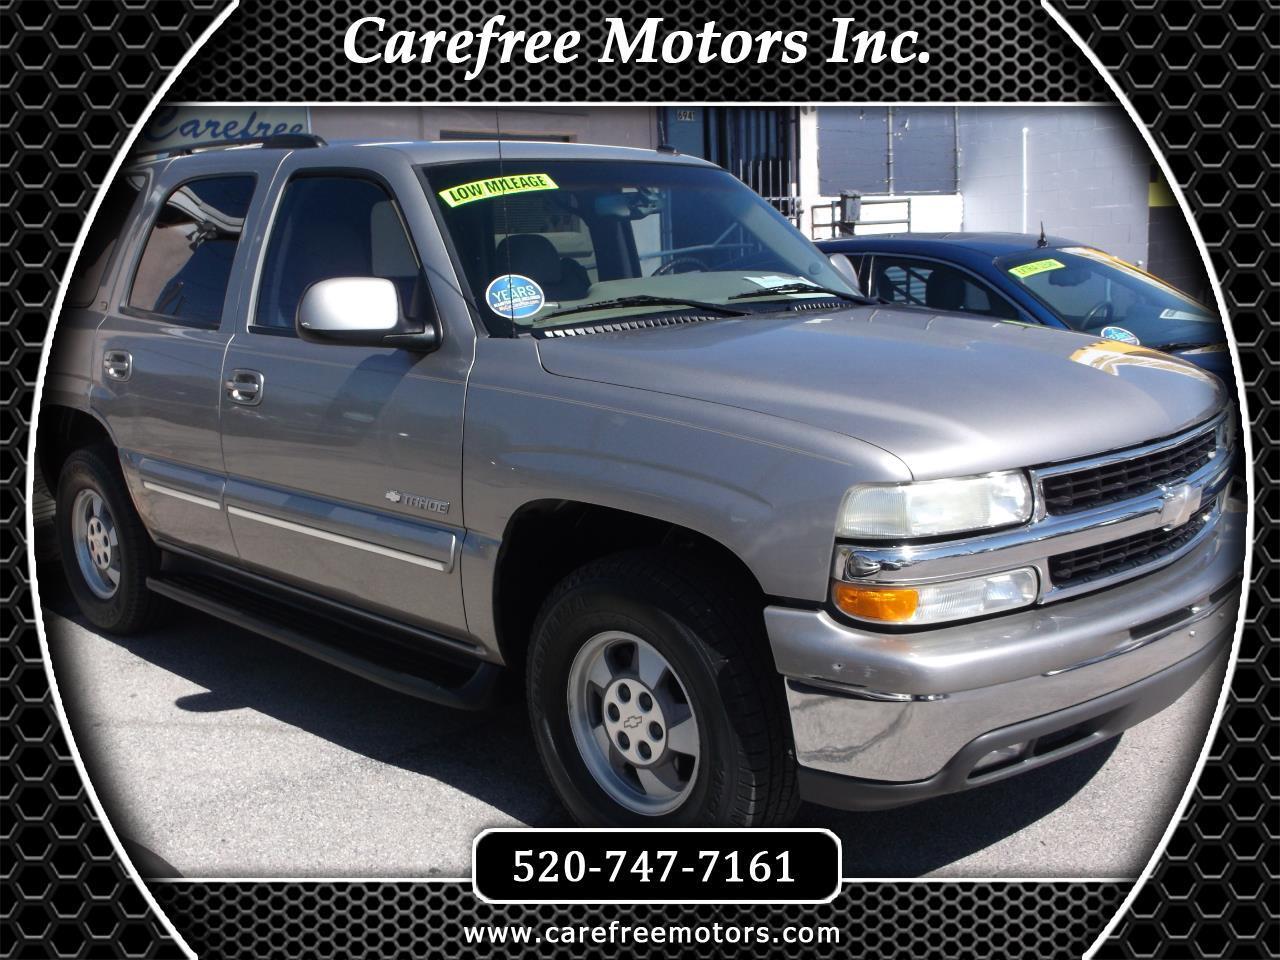 2003 Chevrolet Tahoe 2WD